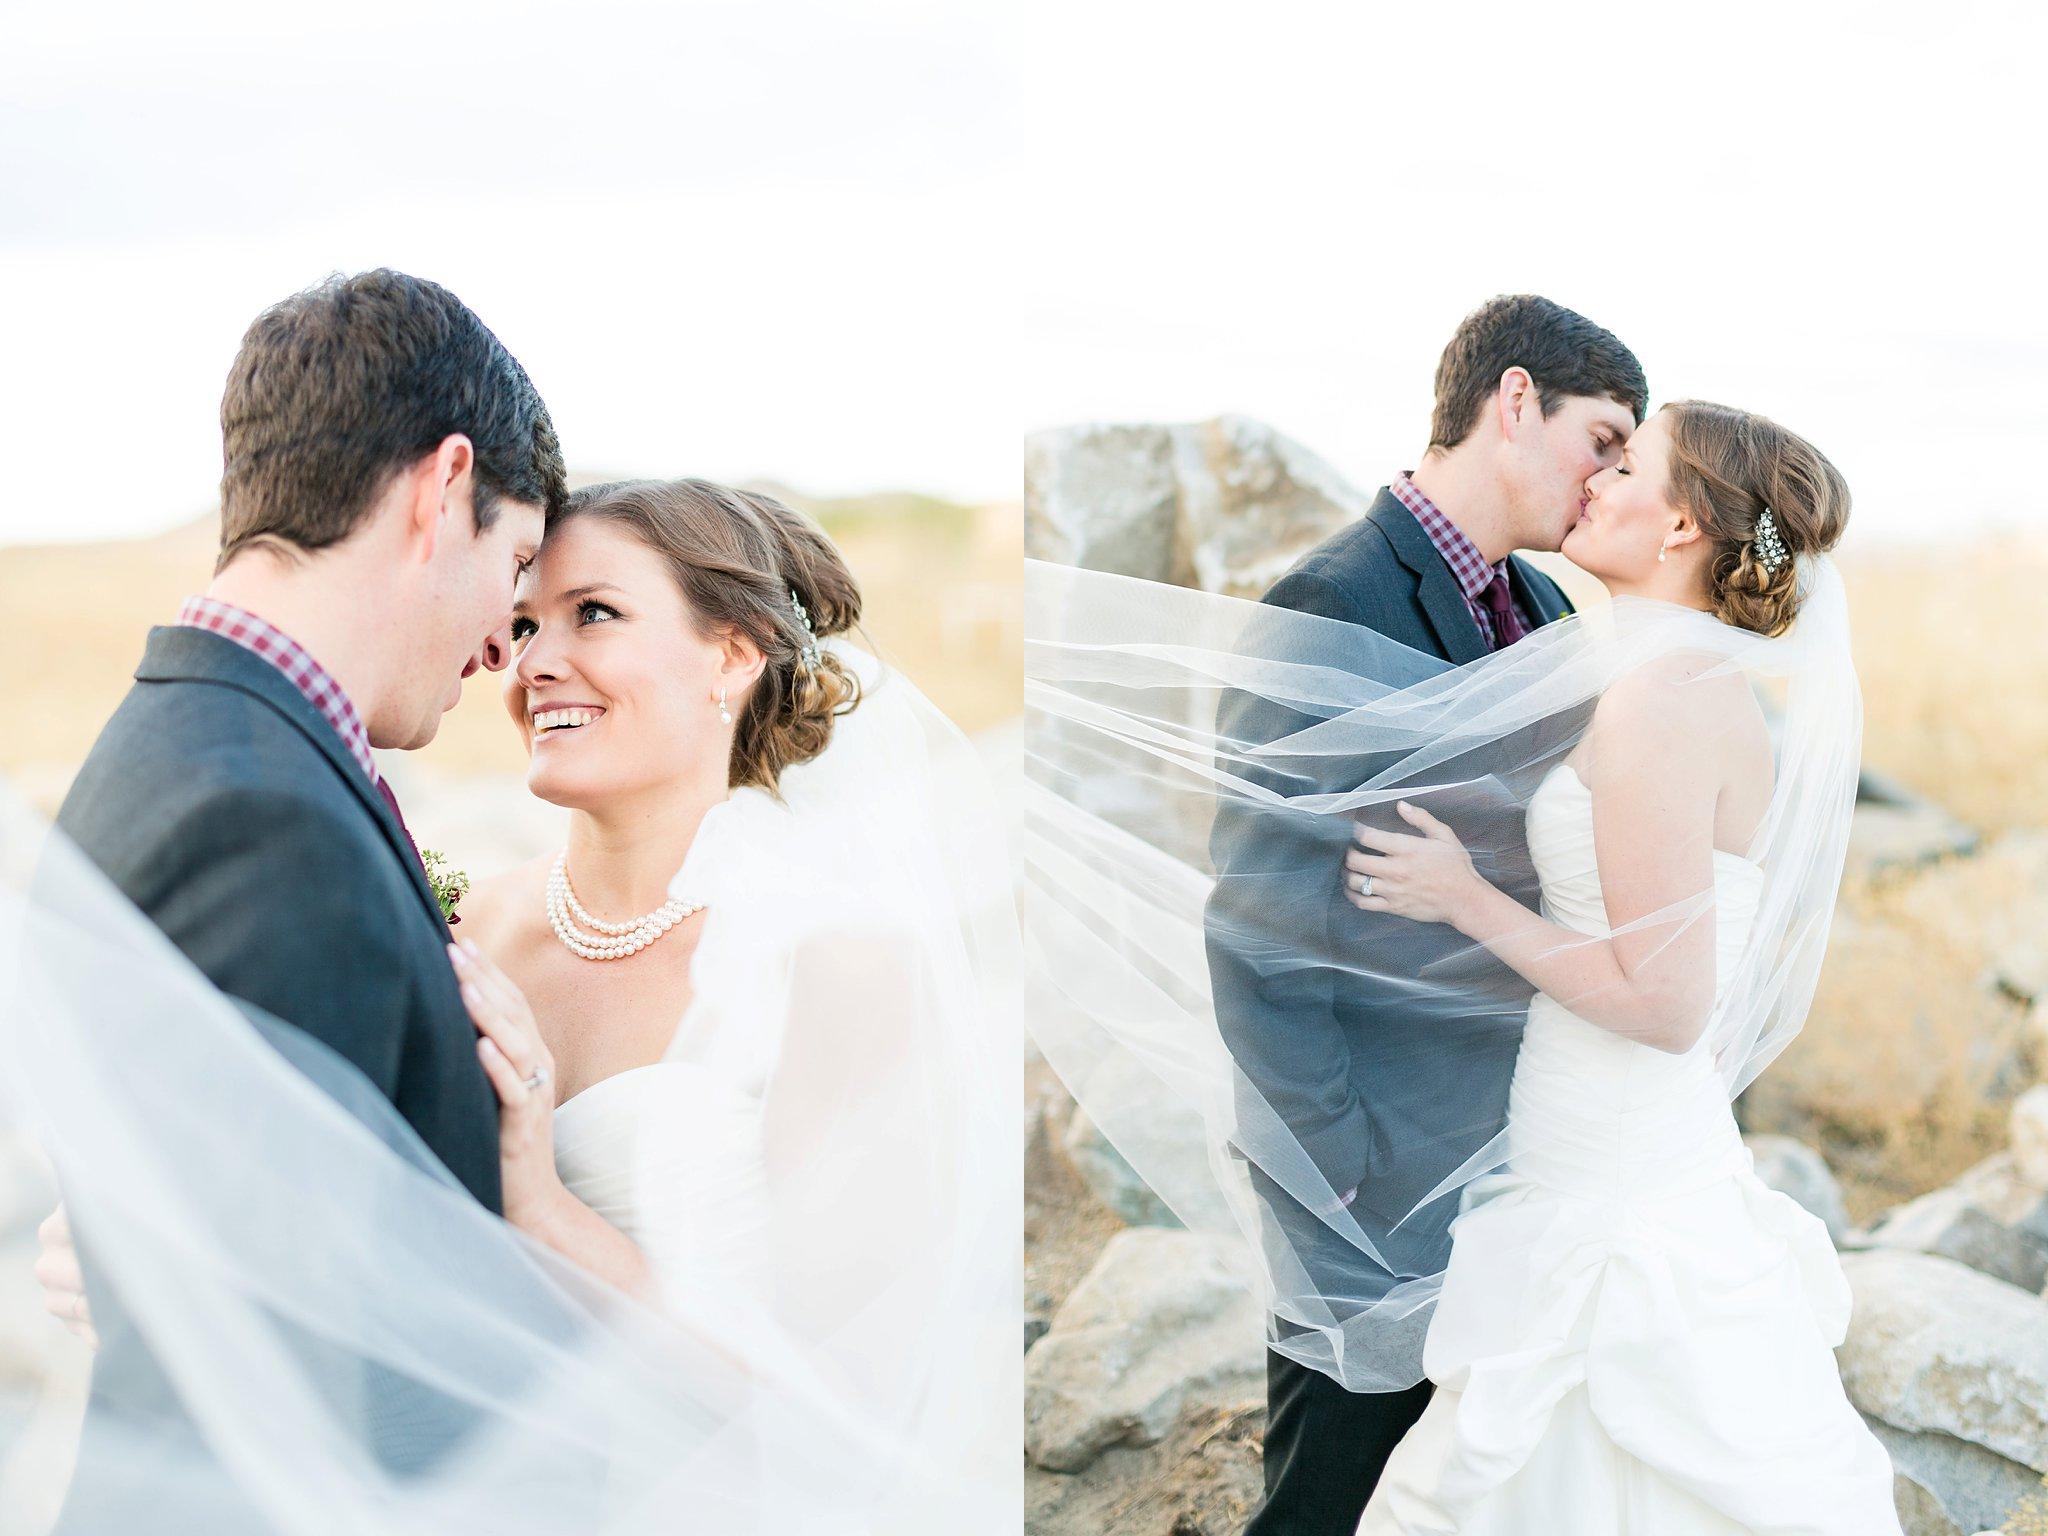 Chelan Washington Wedding Photos Megan Kelsey Photography Delight Wedding Workshop Styled Shoot Annalee & Scot-196.jpg